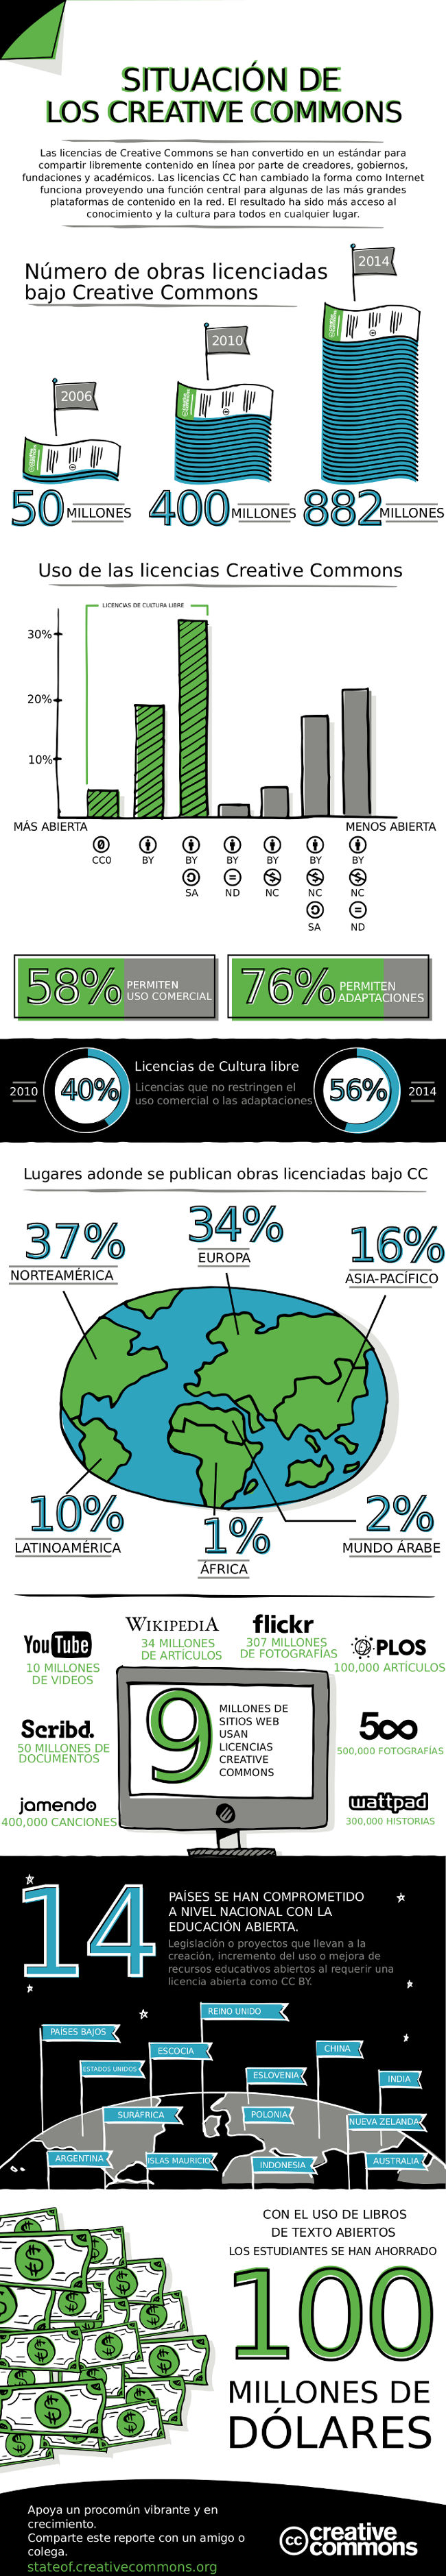 CC-Spanish-LatinAmerica